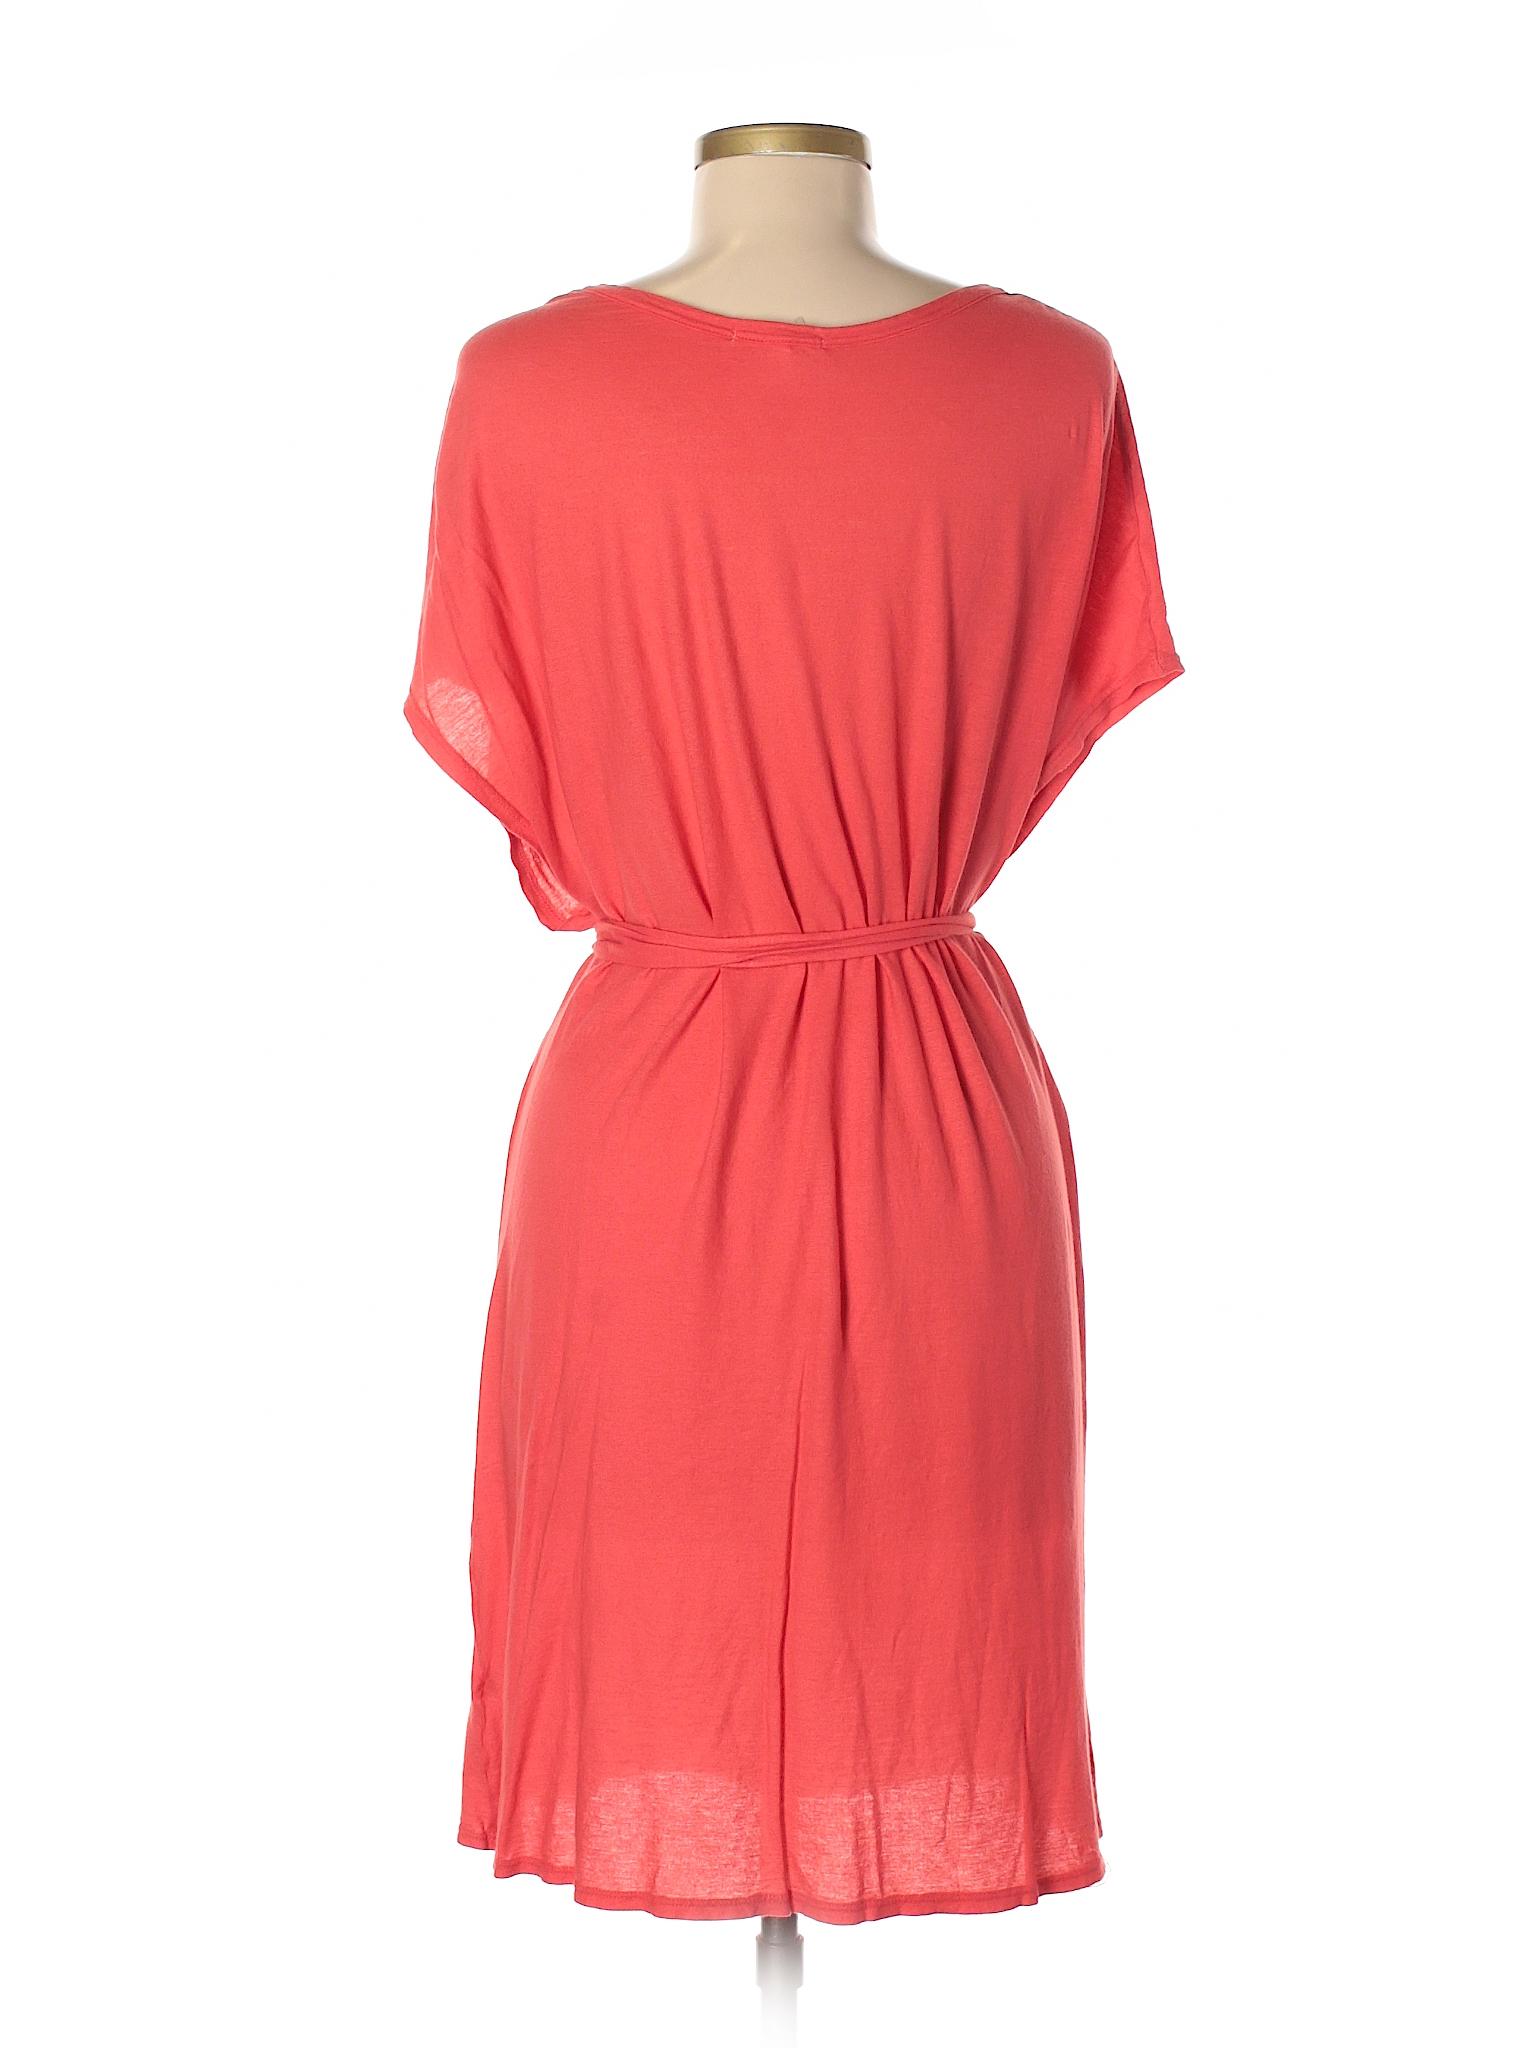 Selling Sundry Selling Dress Sundry Sundry Dress Casual Casual Selling aRqra